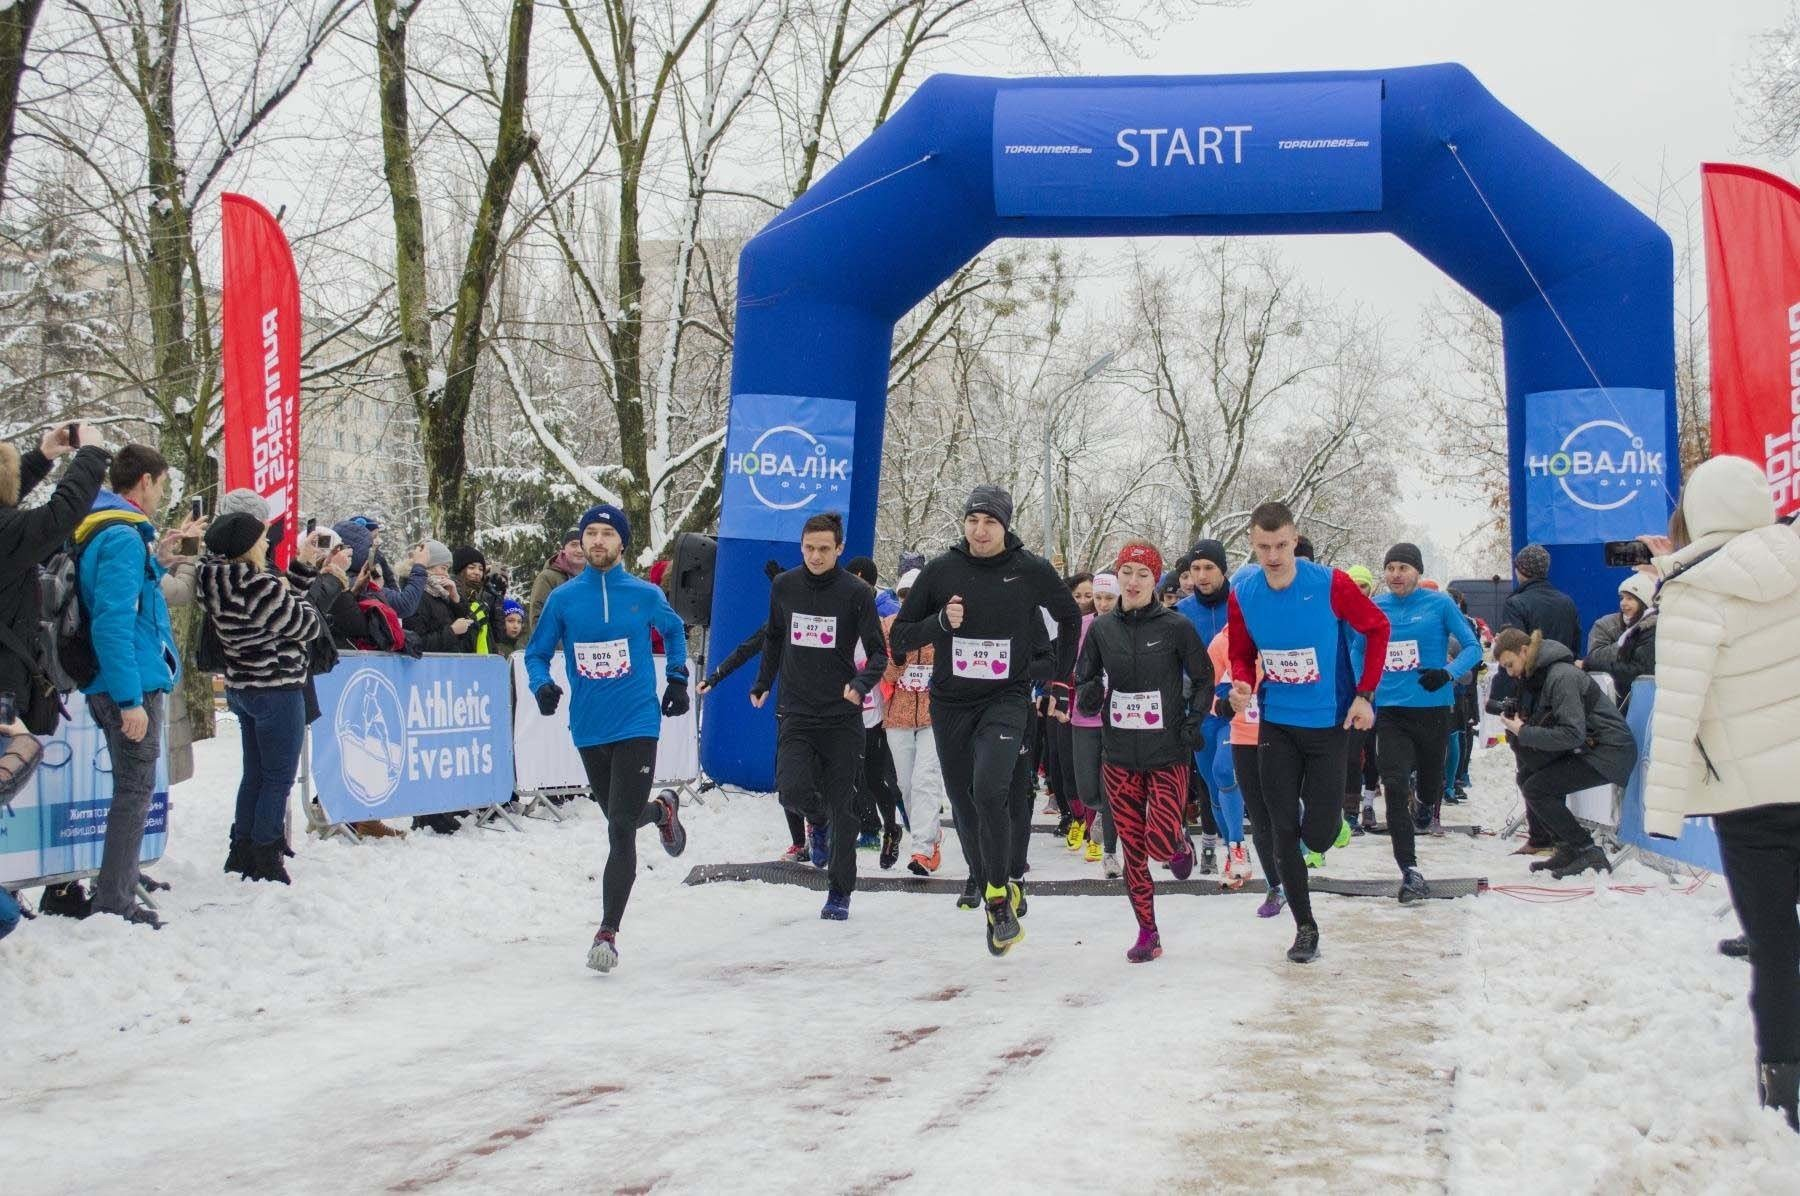 Love Run 2019 - свято бігу, наповнене коханням